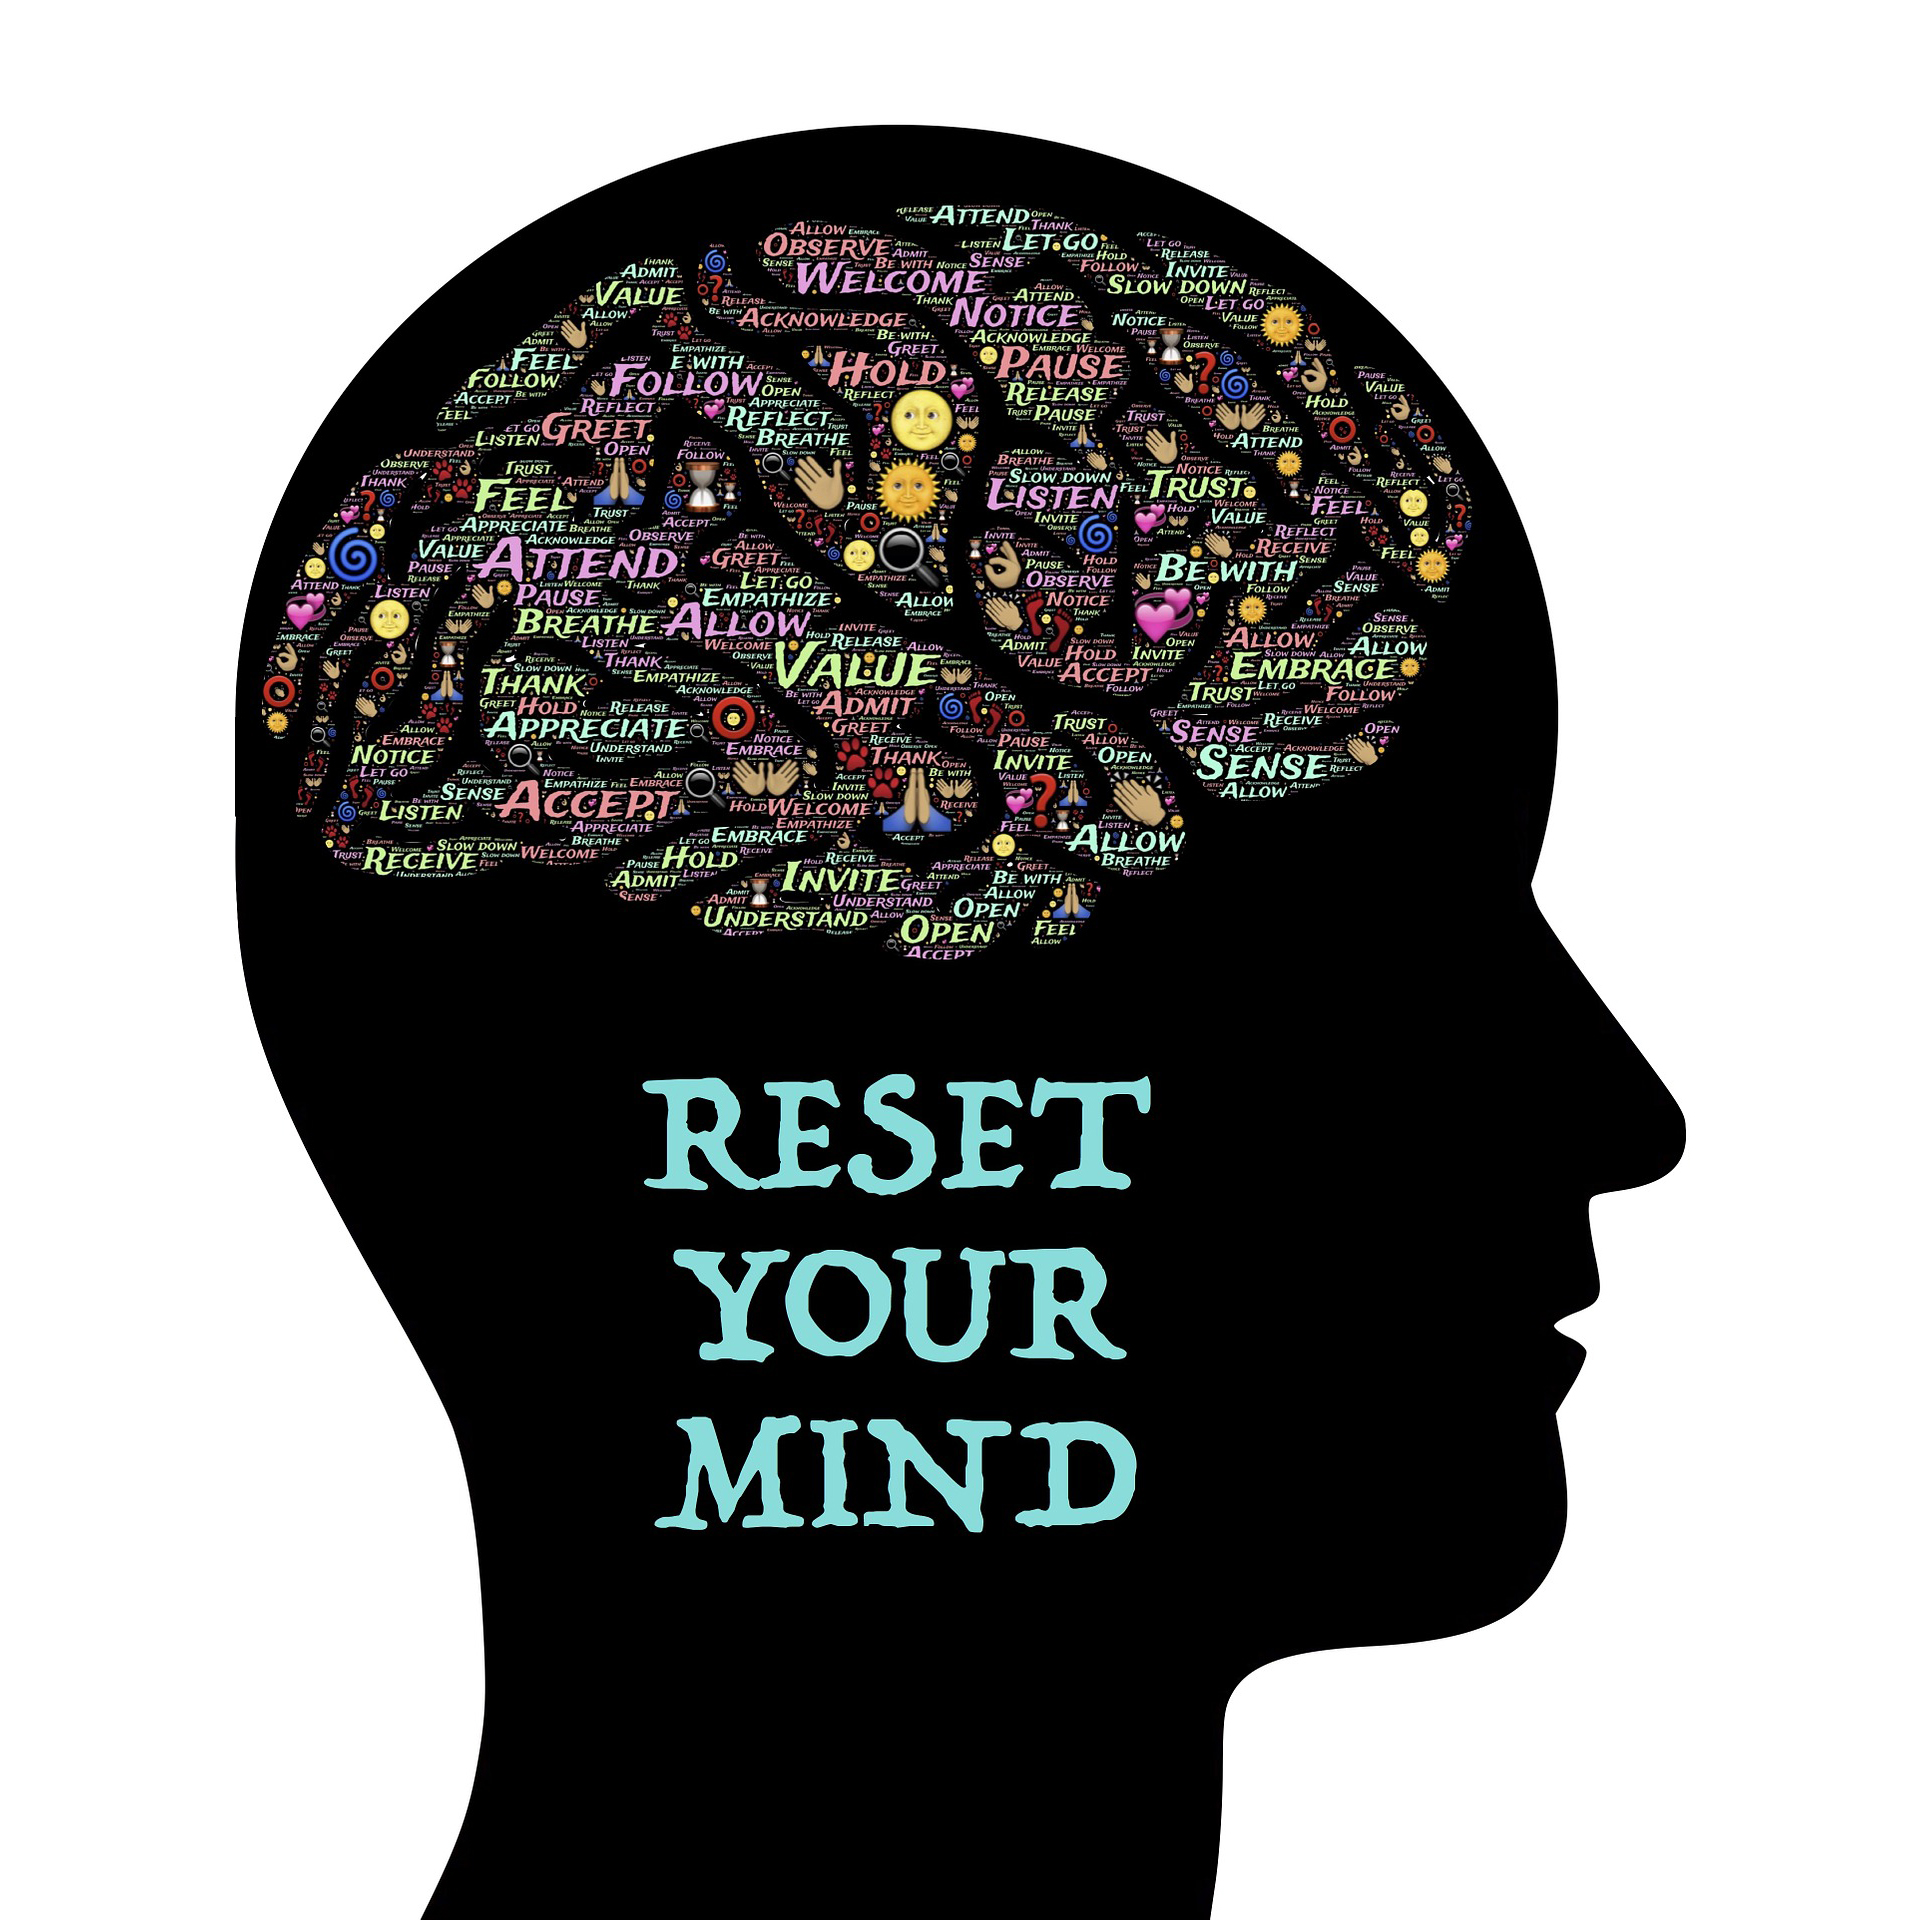 mindset-743161_1920.jpg